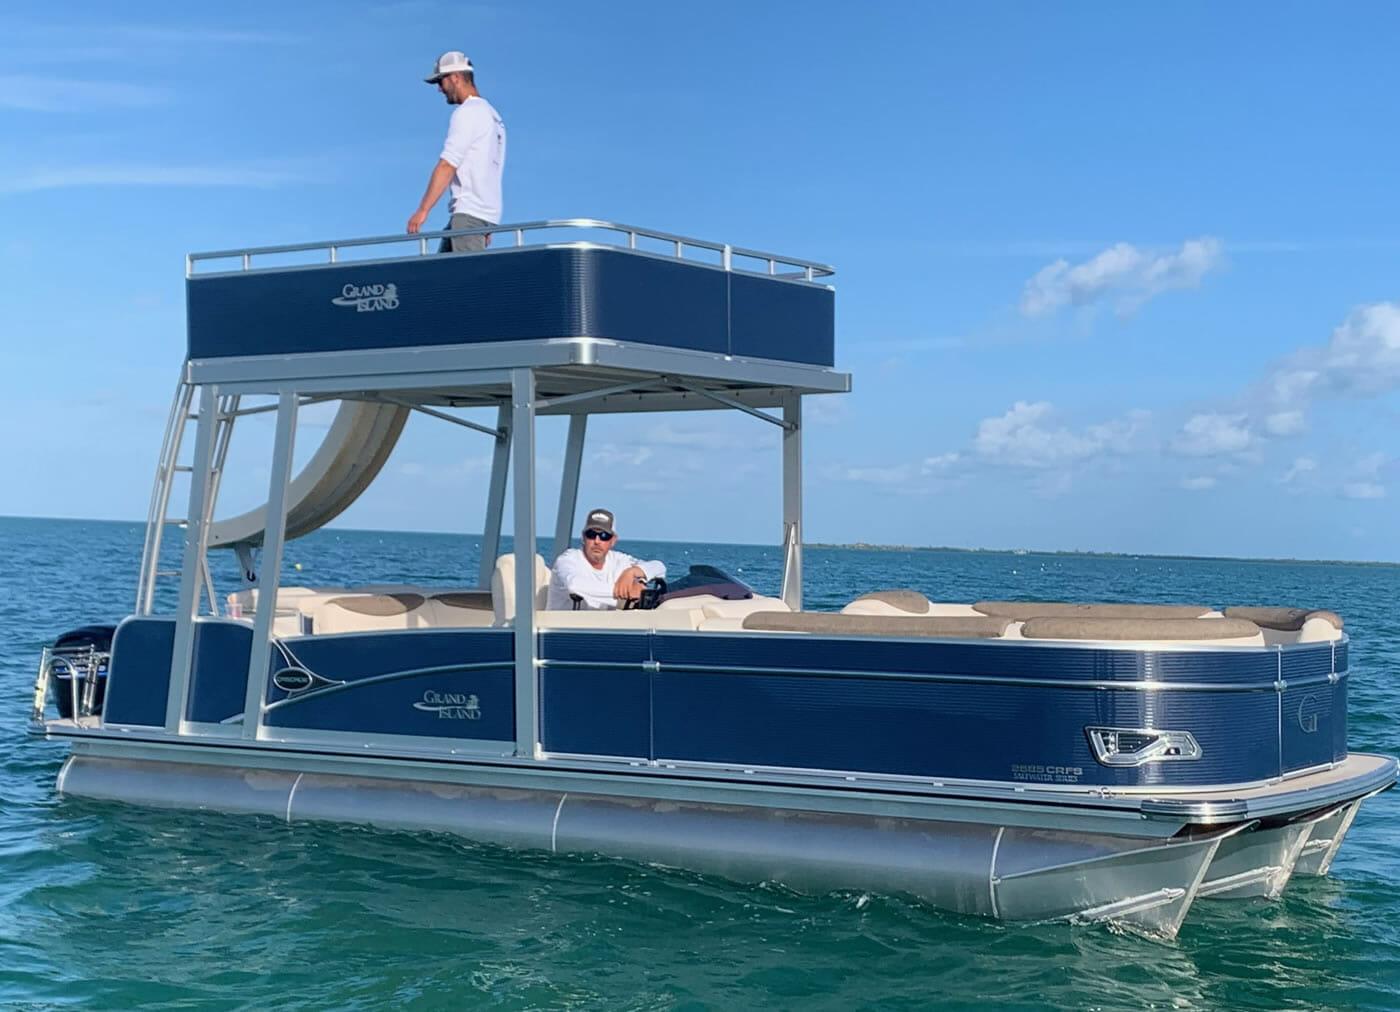 Snorkel Trips - Florida Keys